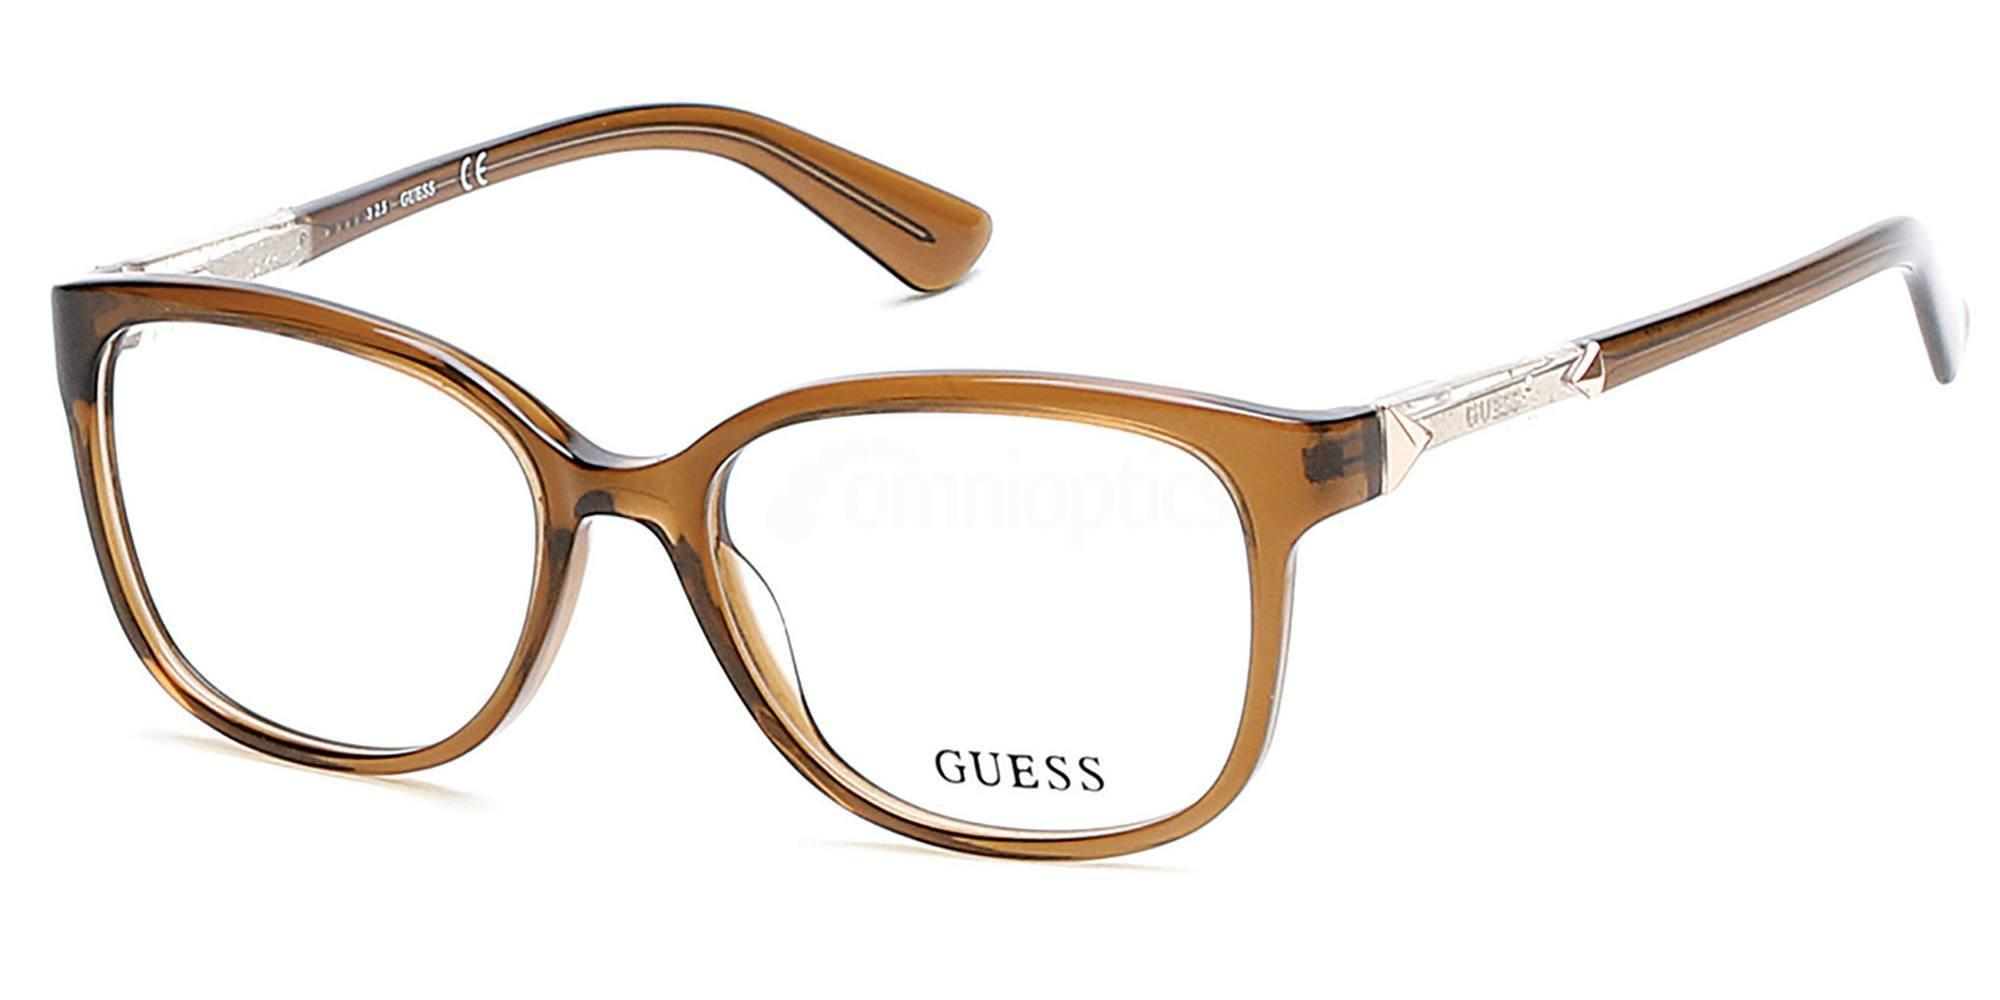 045 GU2560 , Guess